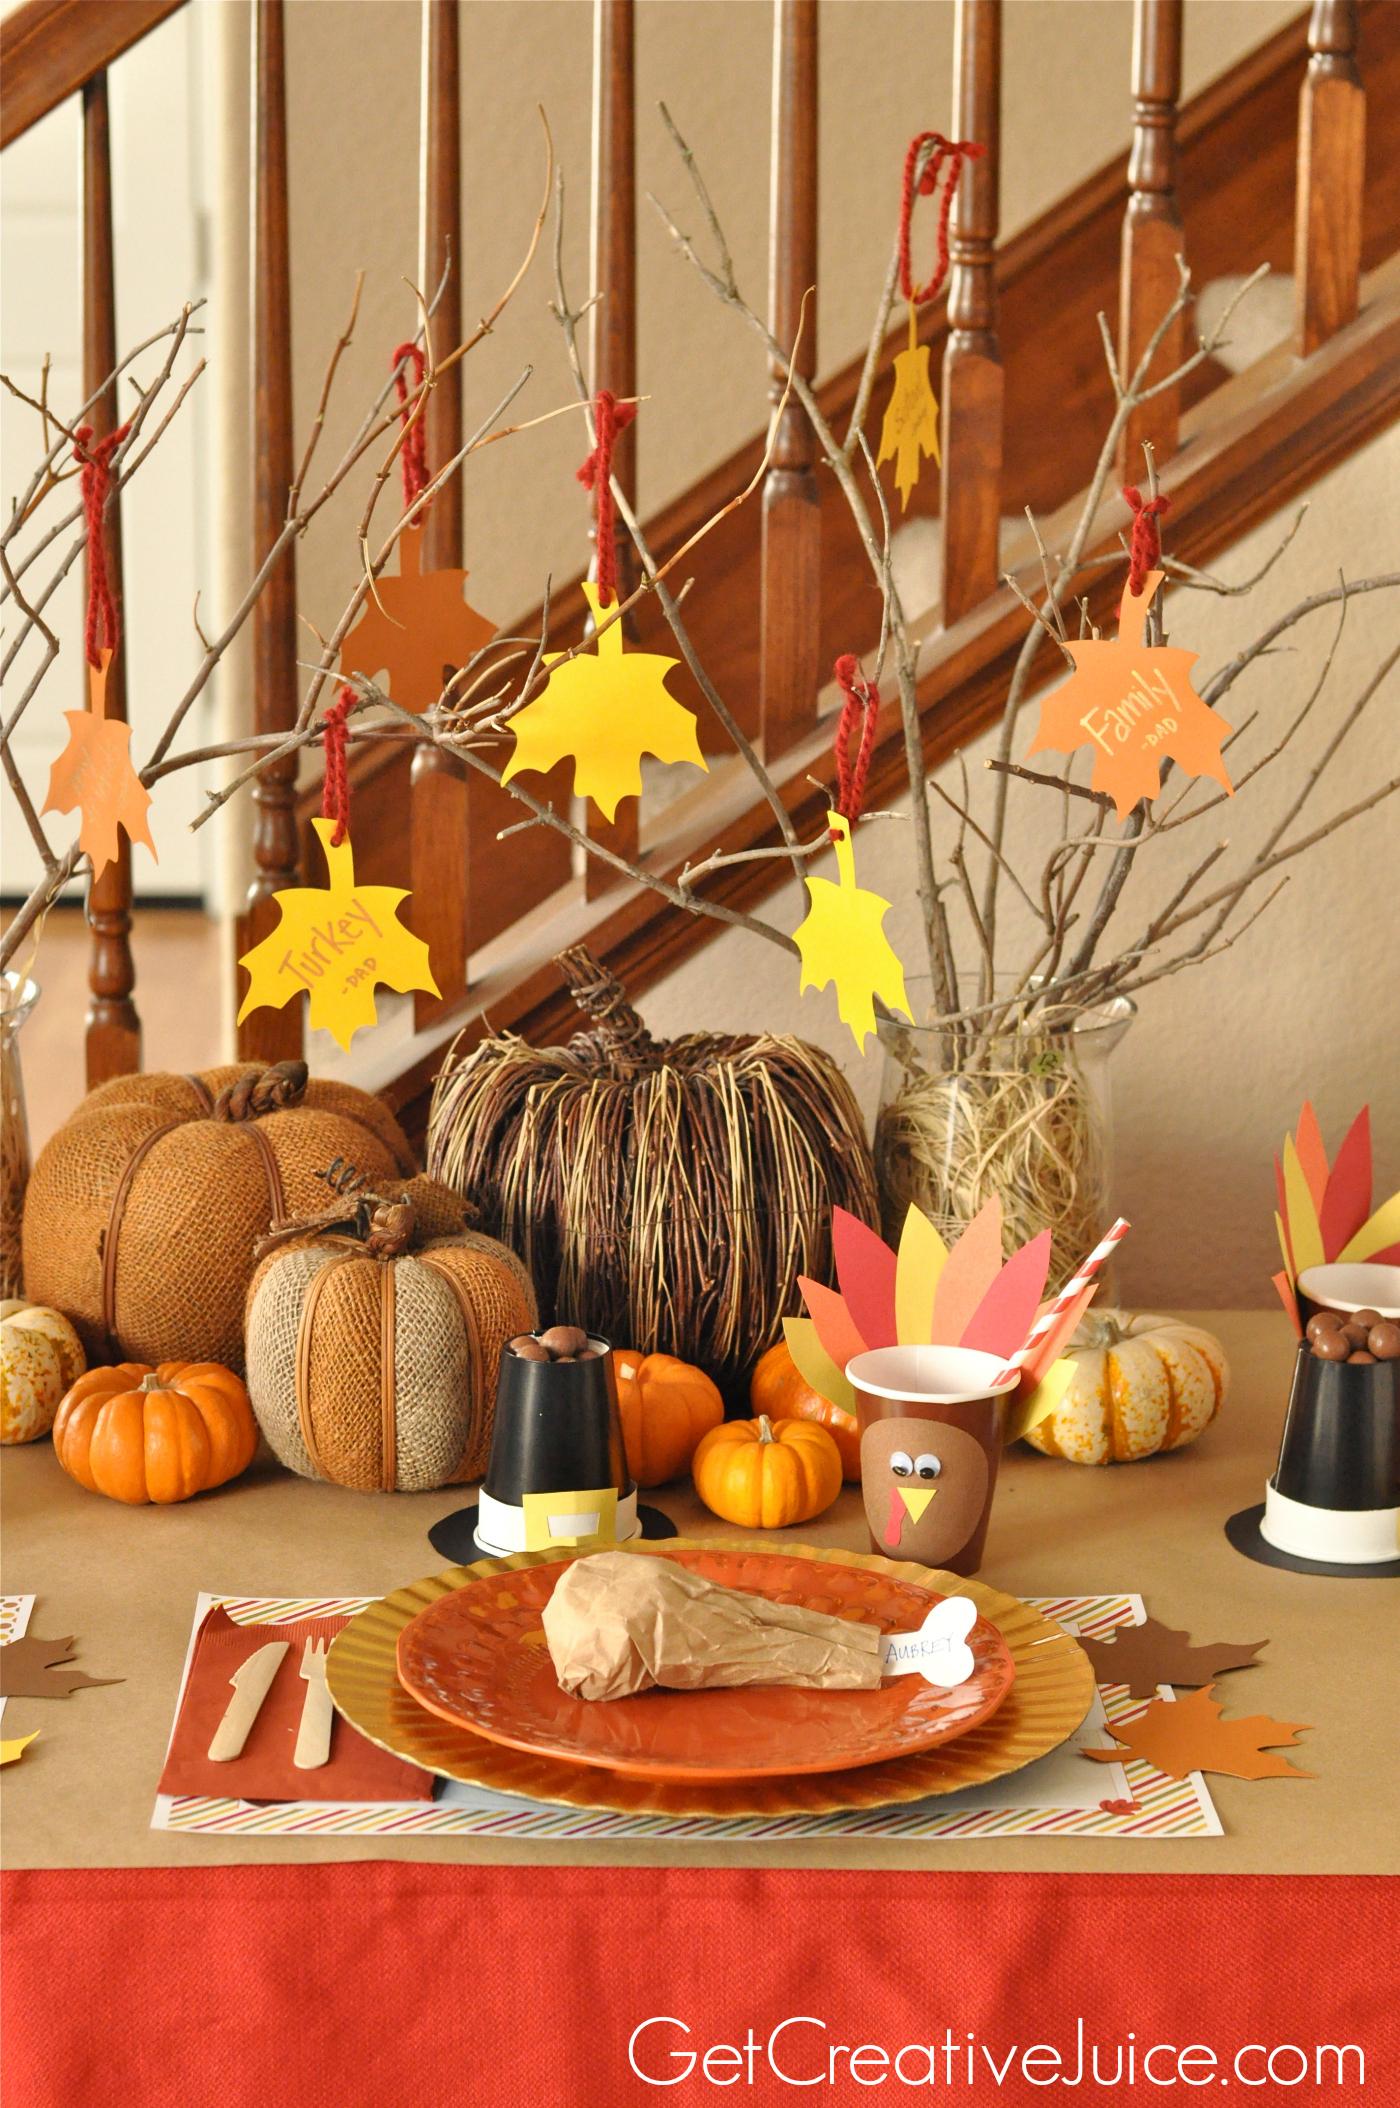 Easy DIY Kids Thanksgiving Table Ideas - Creative Juice